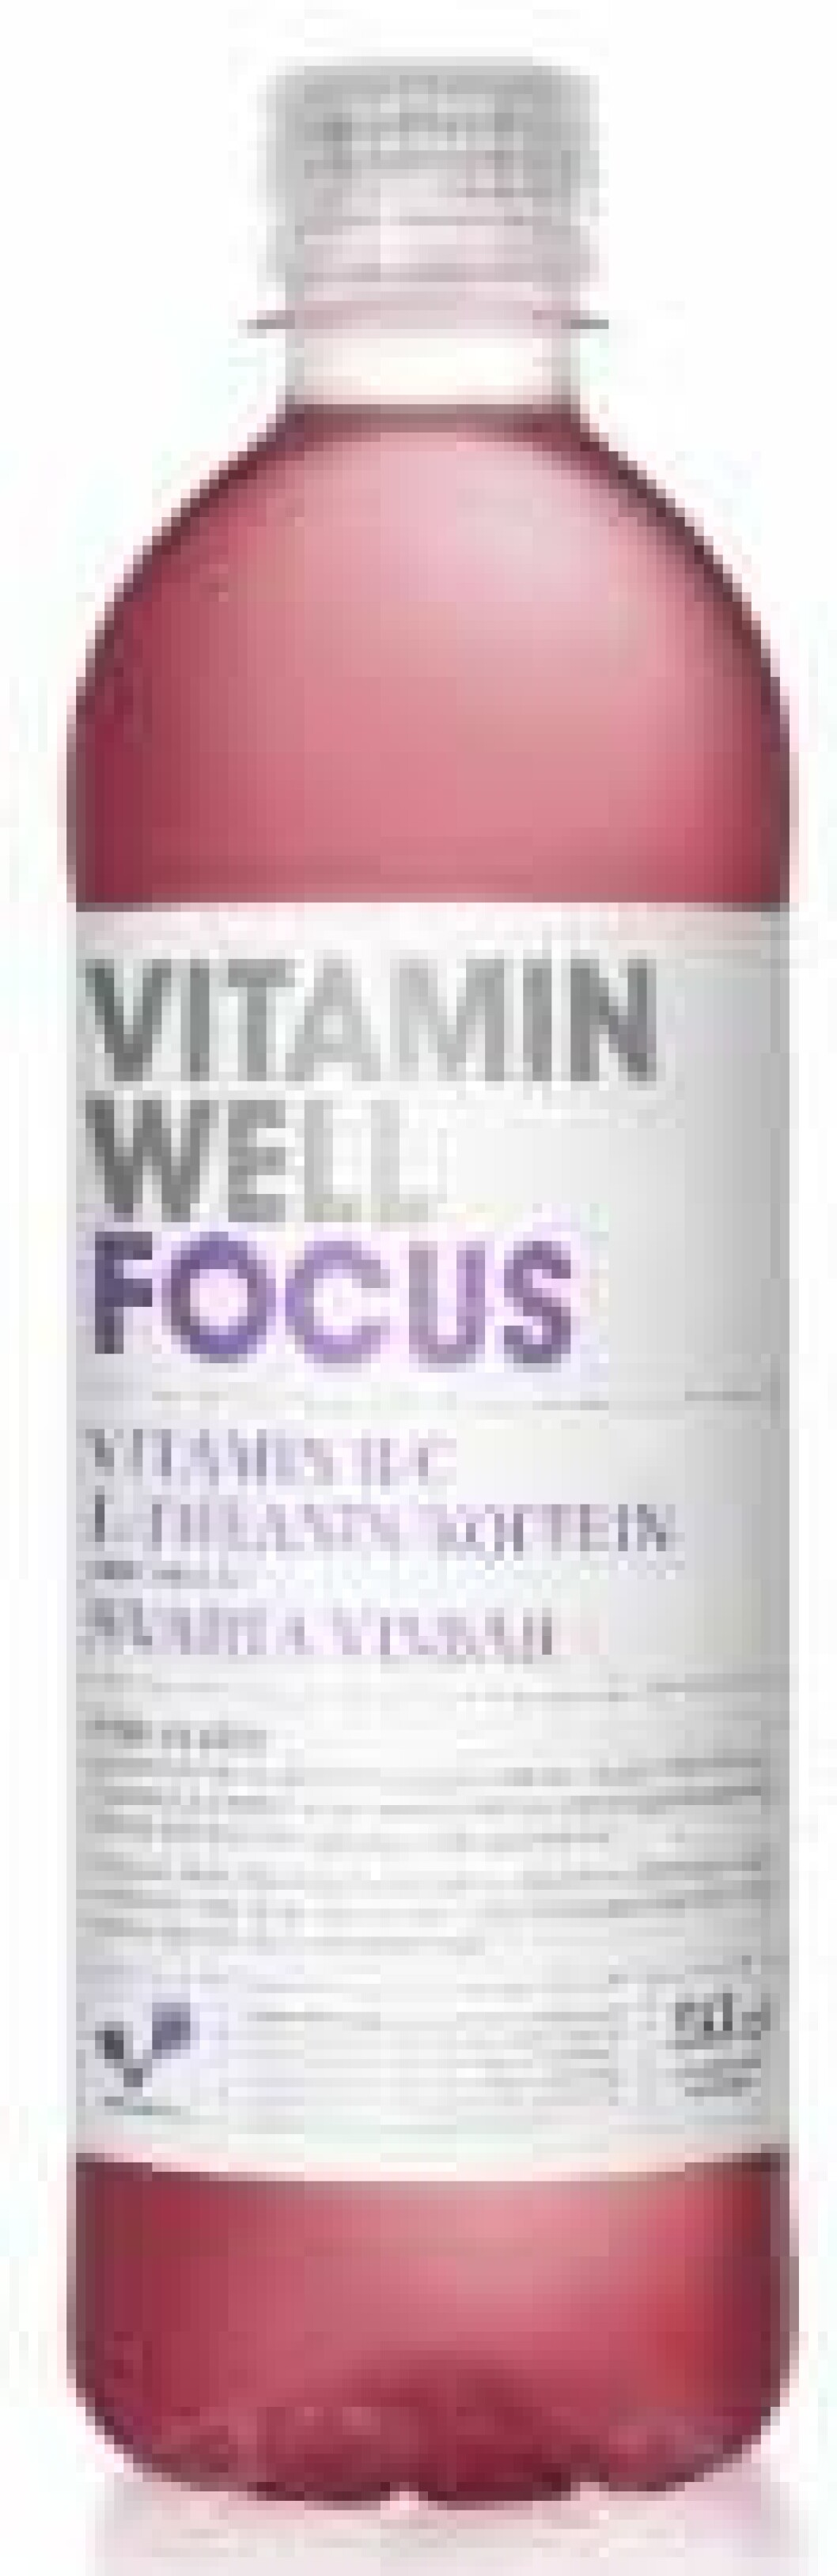 vitamin-well.jpg